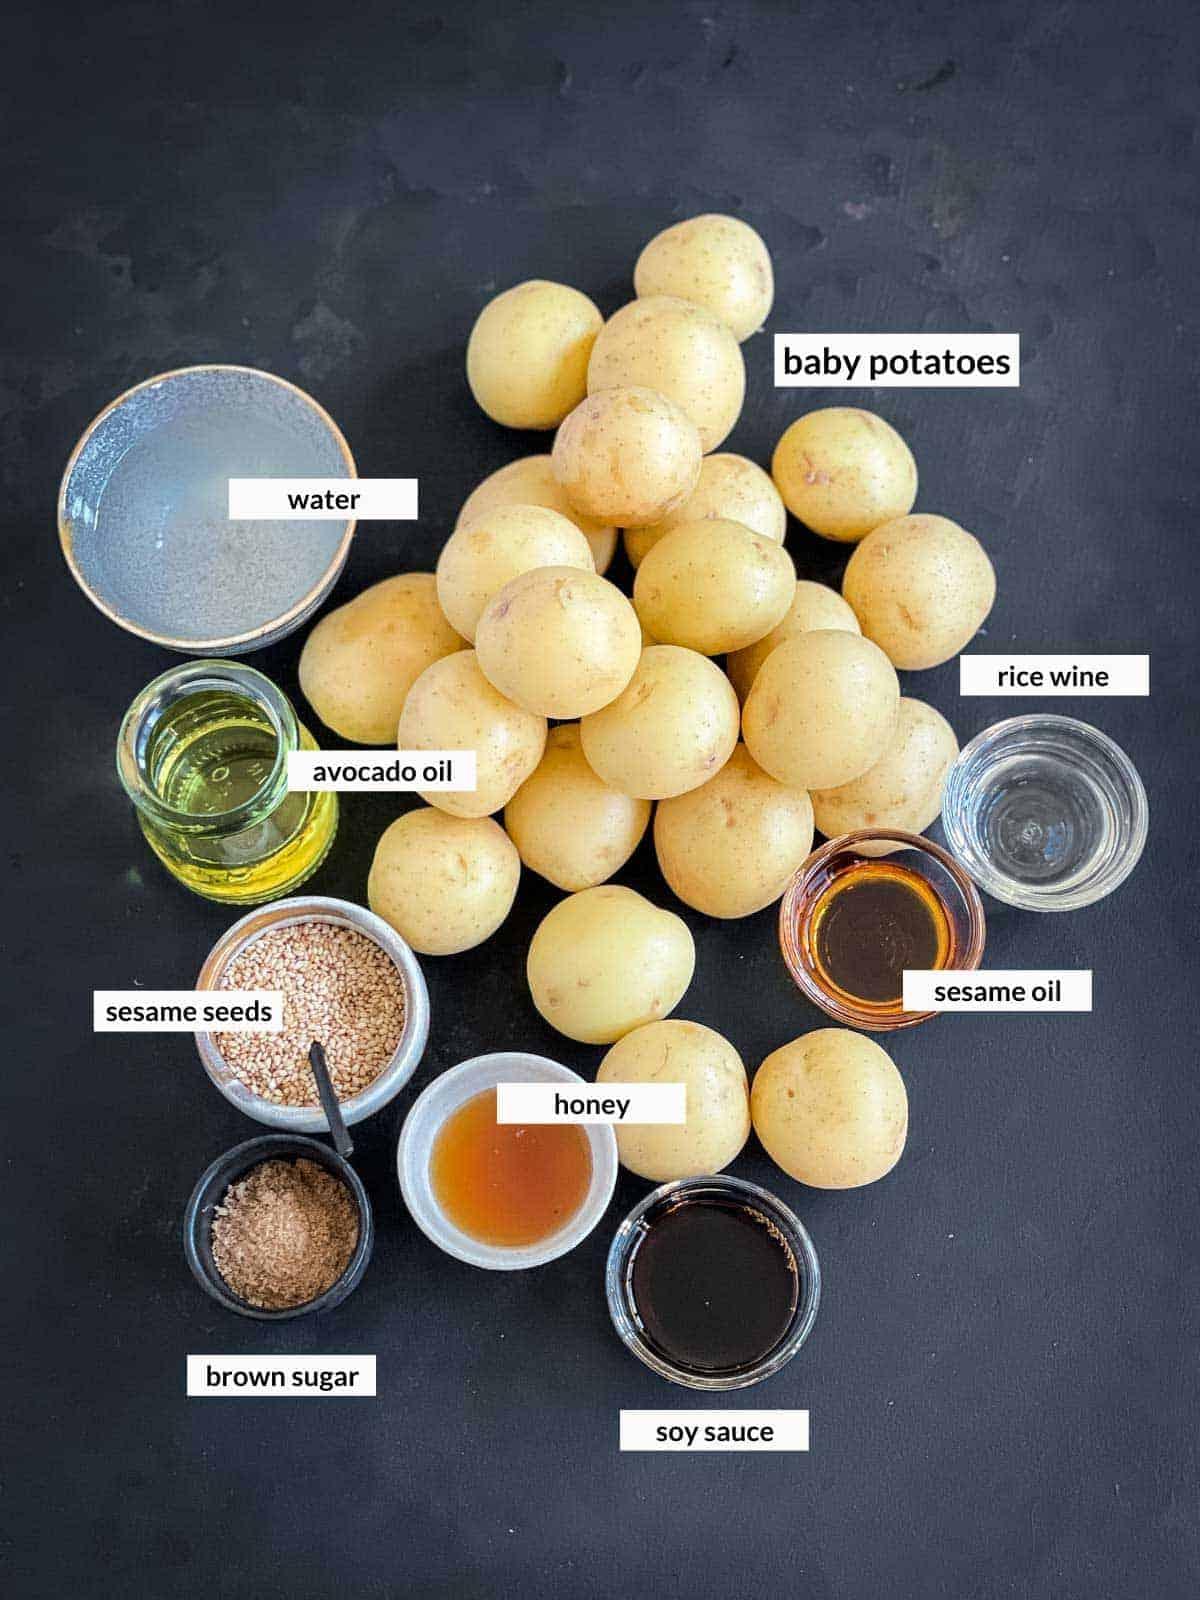 Korean Braised Potatoes - Gamja Jorim (감자조림) Ingredients